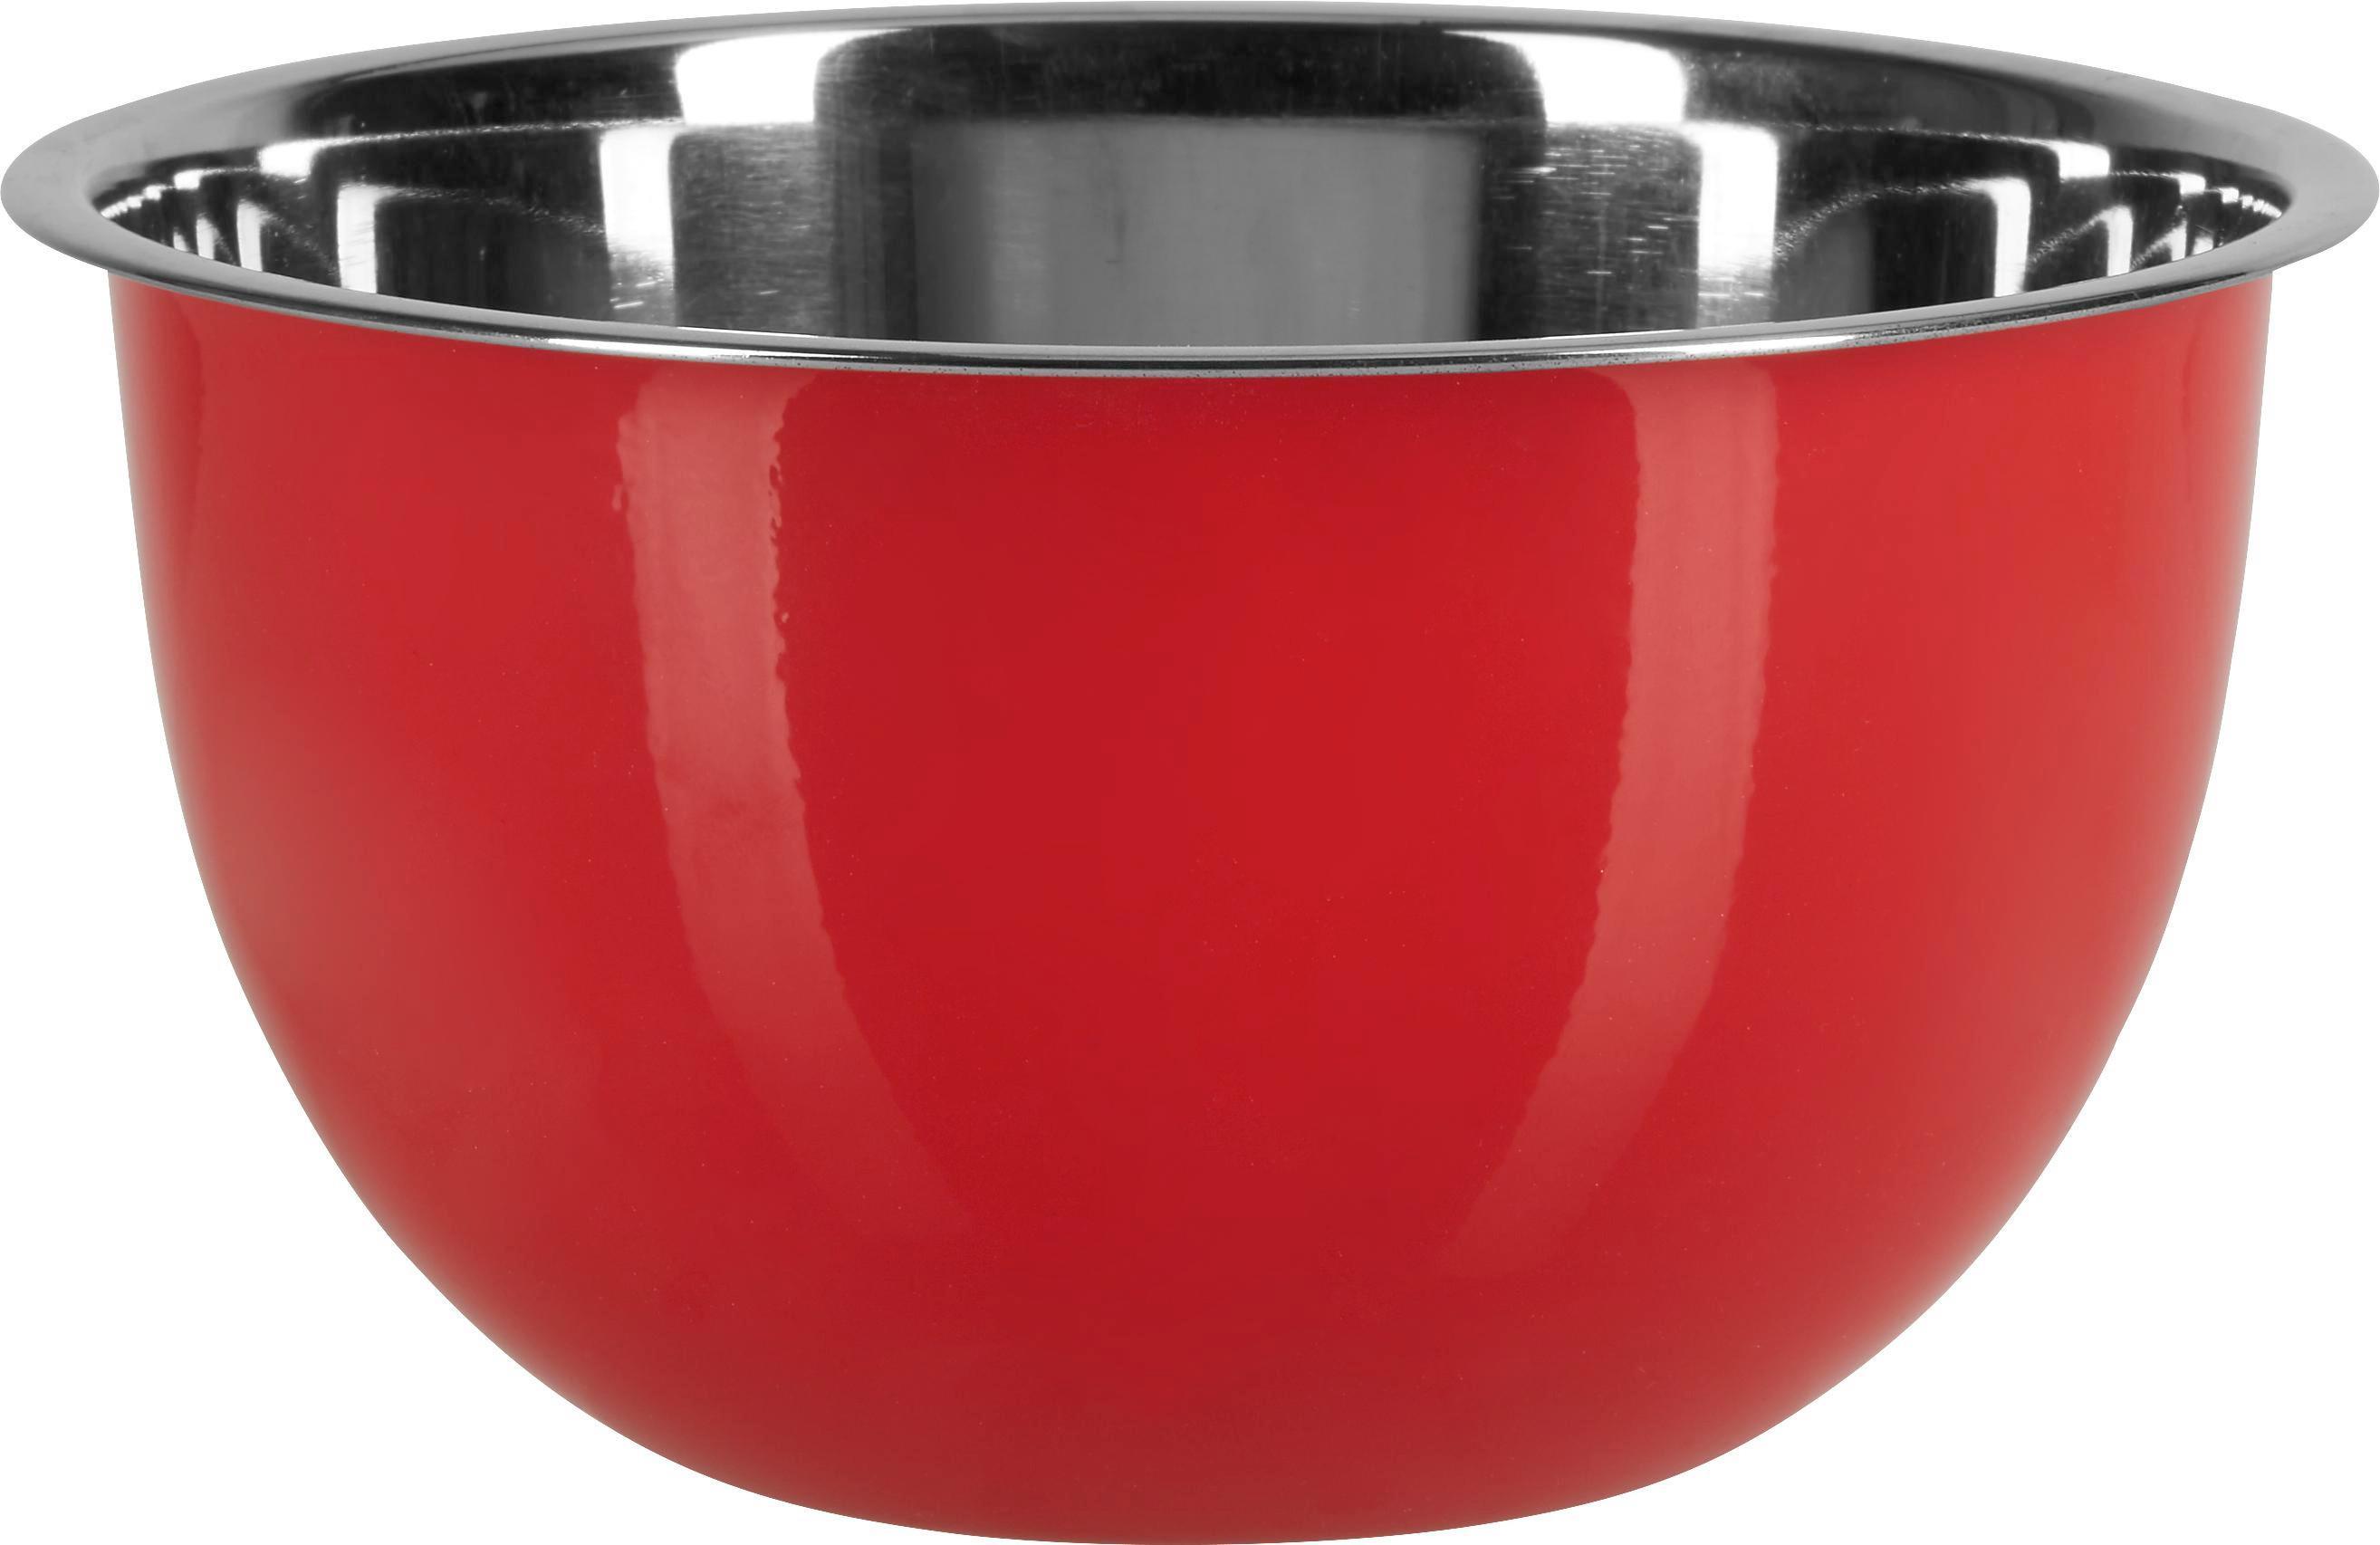 Schüssel Dani in Rot, Ø ca. 22cm - Edelstahlfarben/Rot, Metall (22/12cm) - MÖMAX modern living